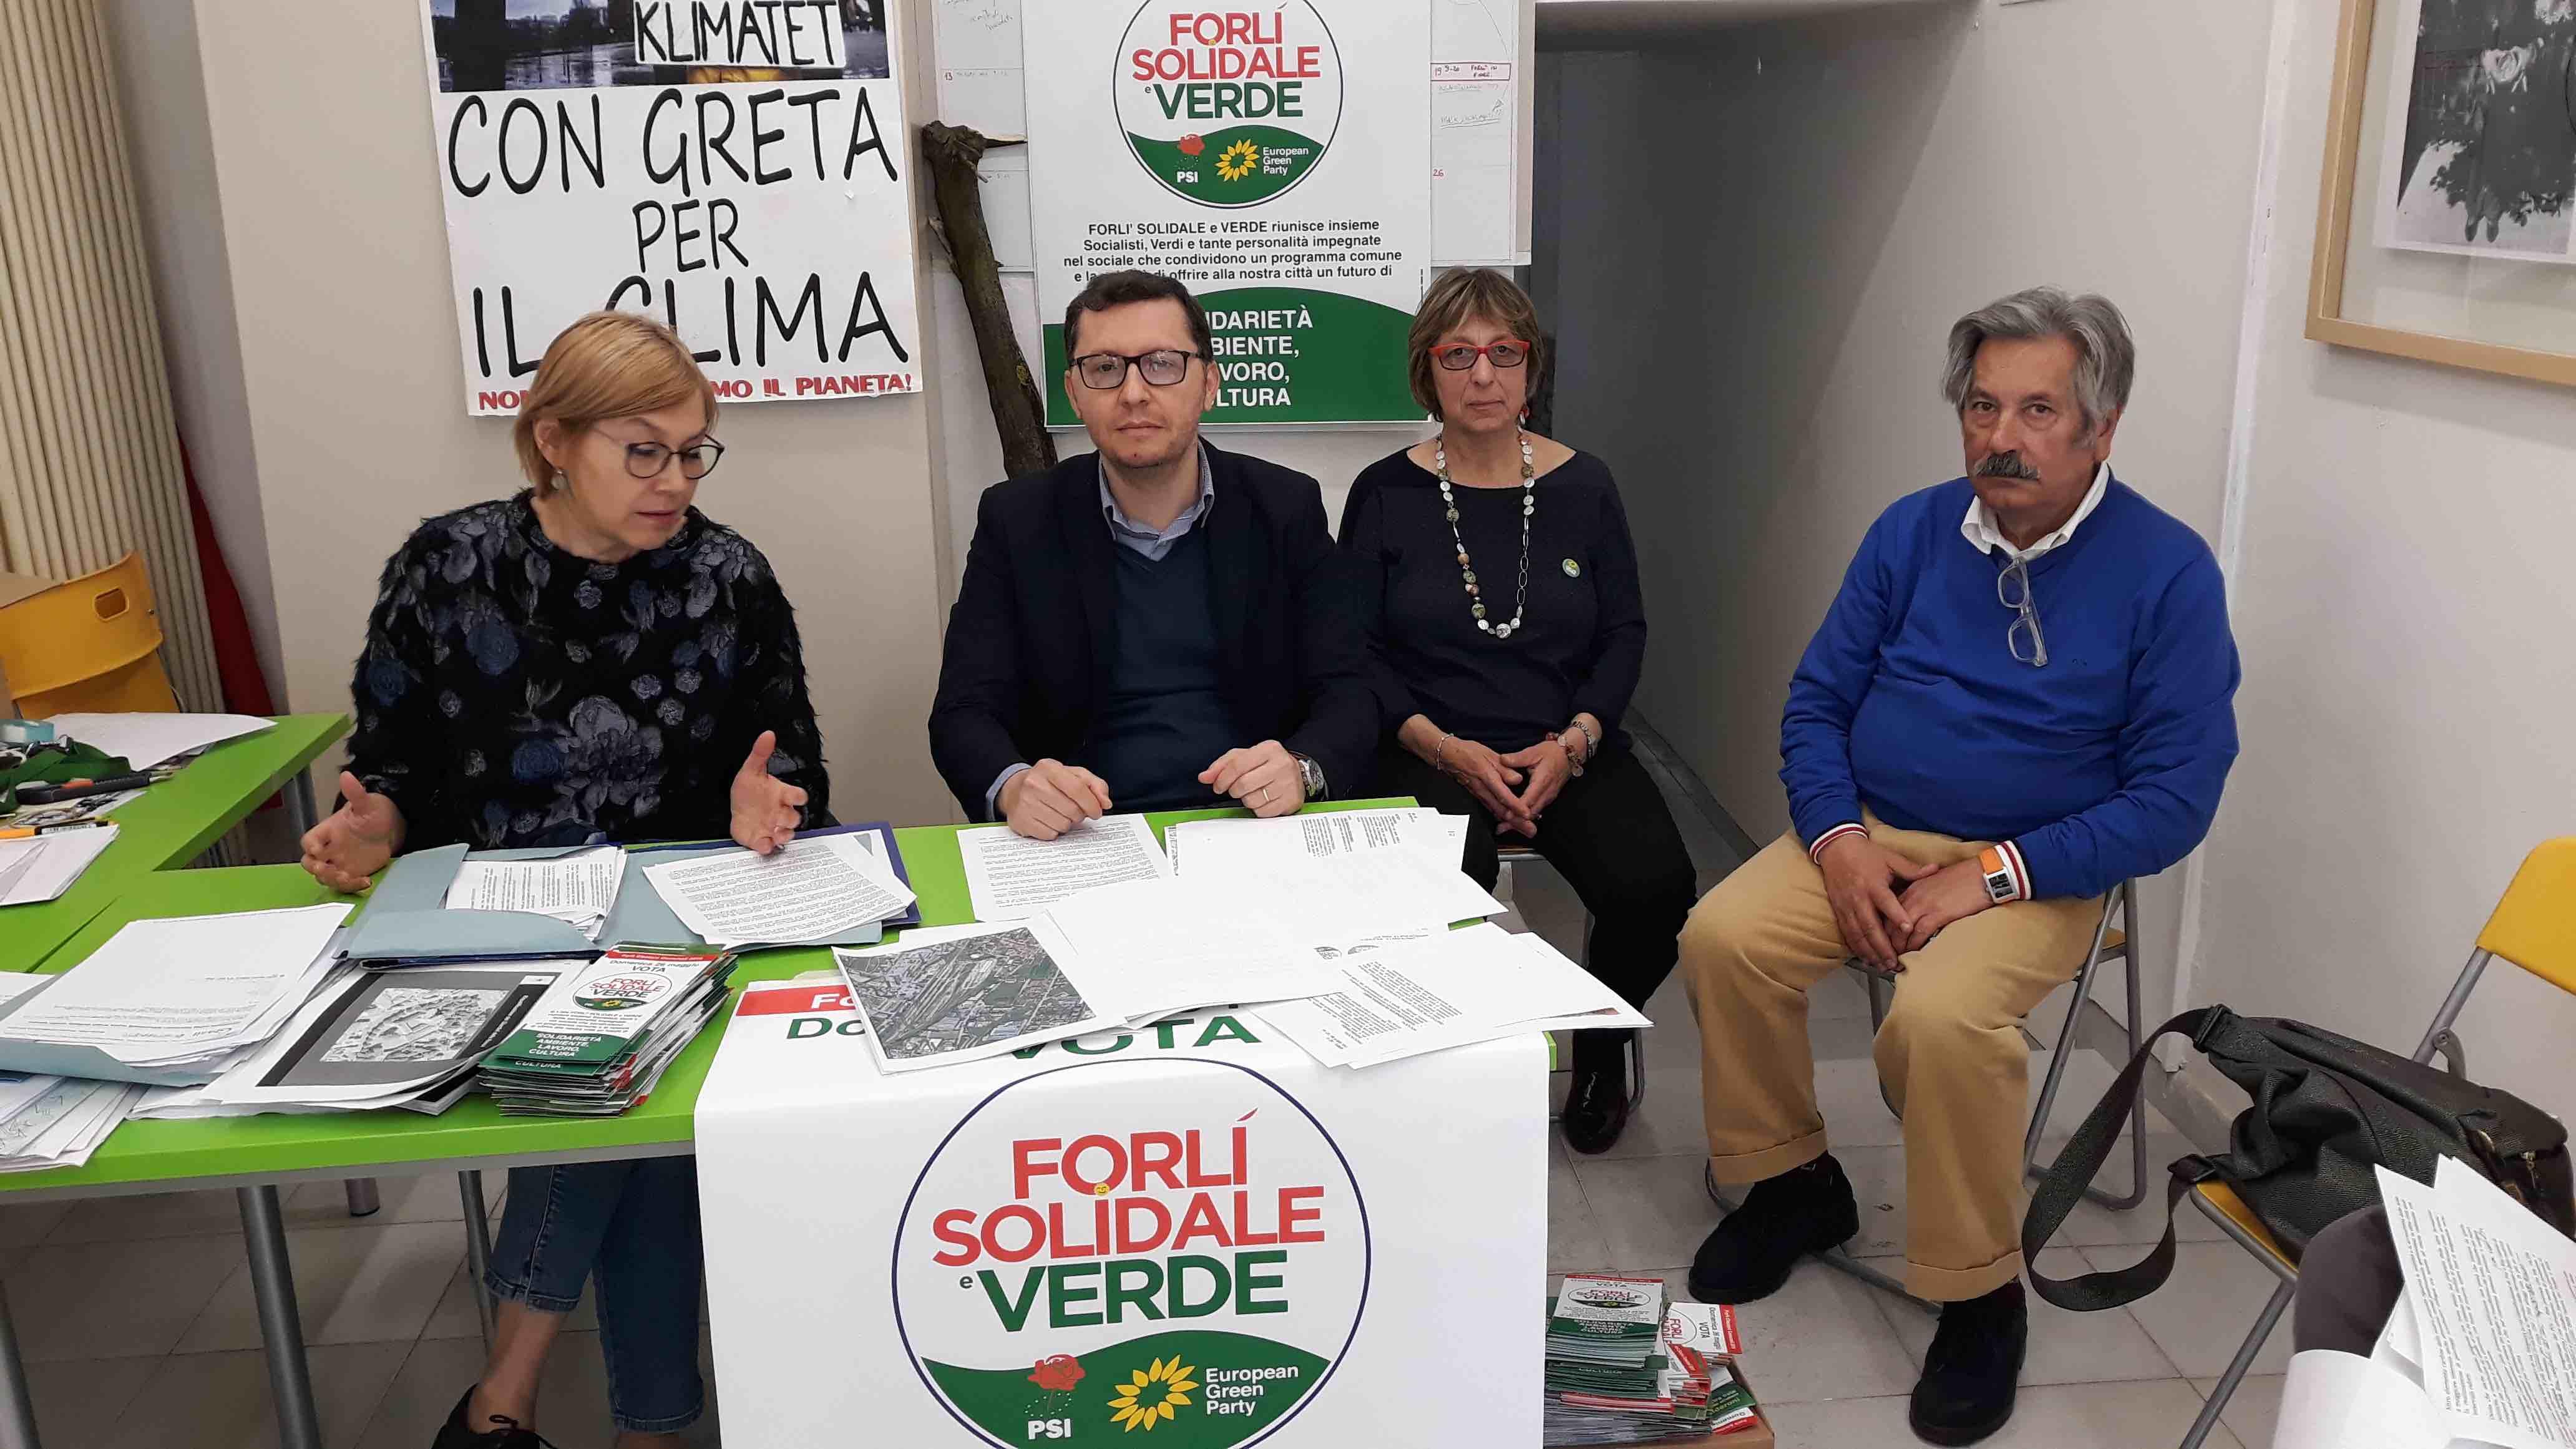 Forli Verde e Solidale Verdi